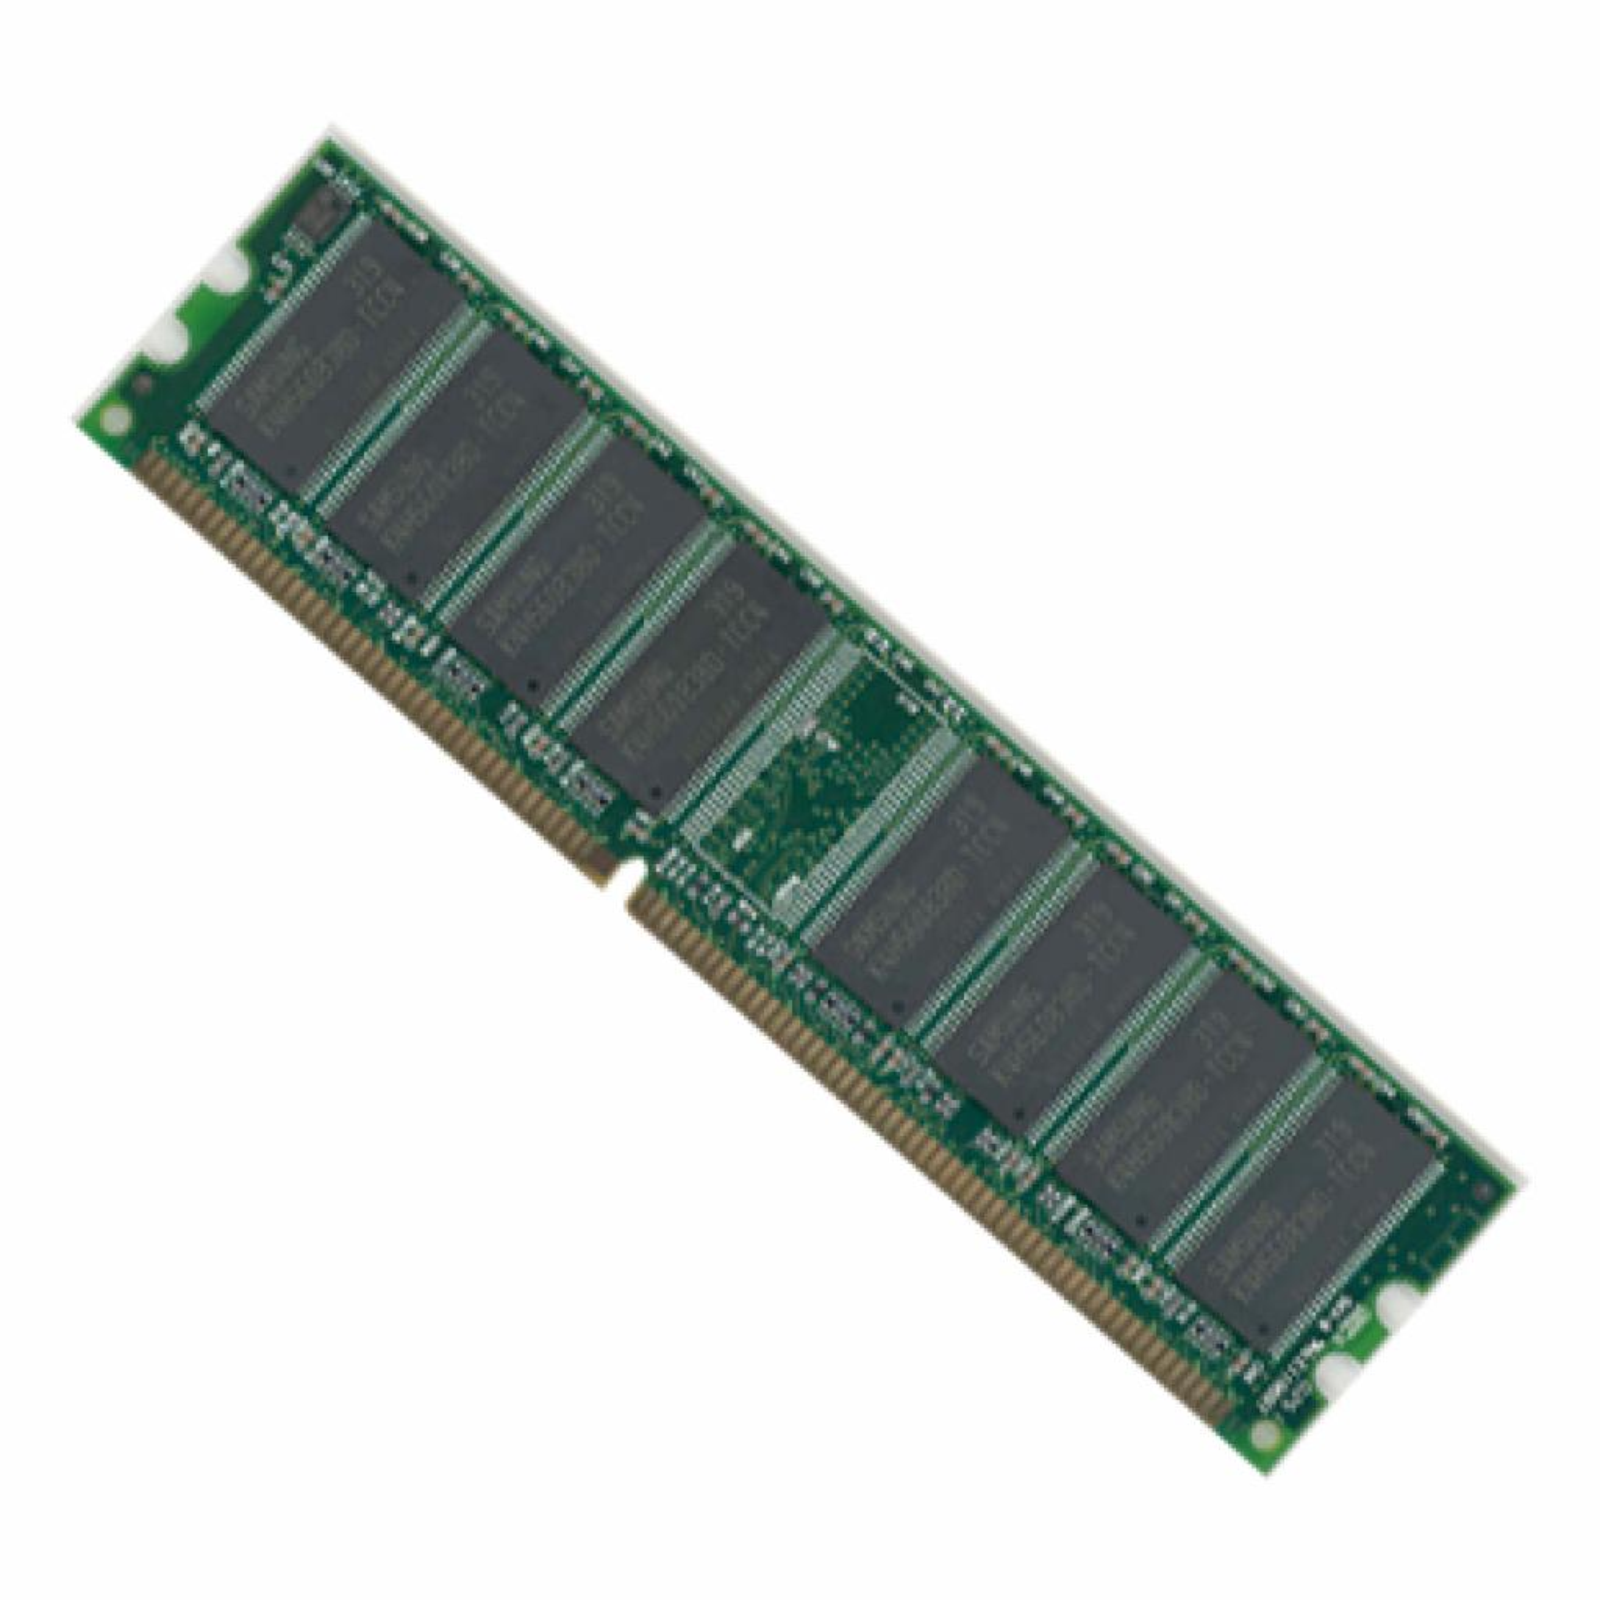 Модуль памяти для компьютера DDR SDRAM 512MB 400 MHz Samsung (K4H560838E-TCCC / K4H560838F-TCCC)